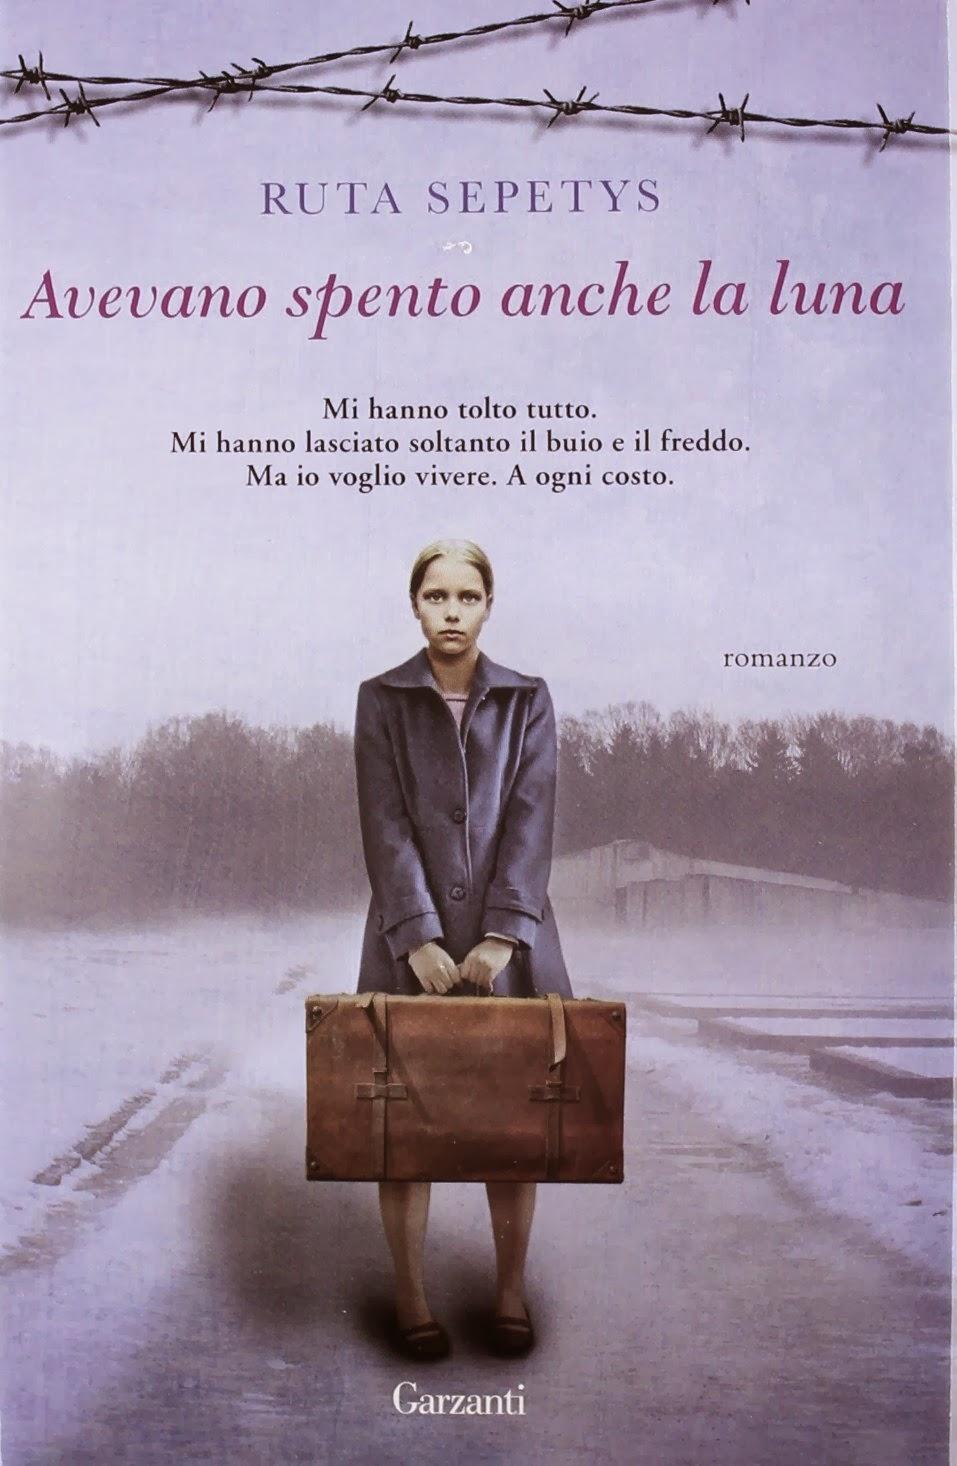 Целая жизнь tutta una vita 1992 1 фотография